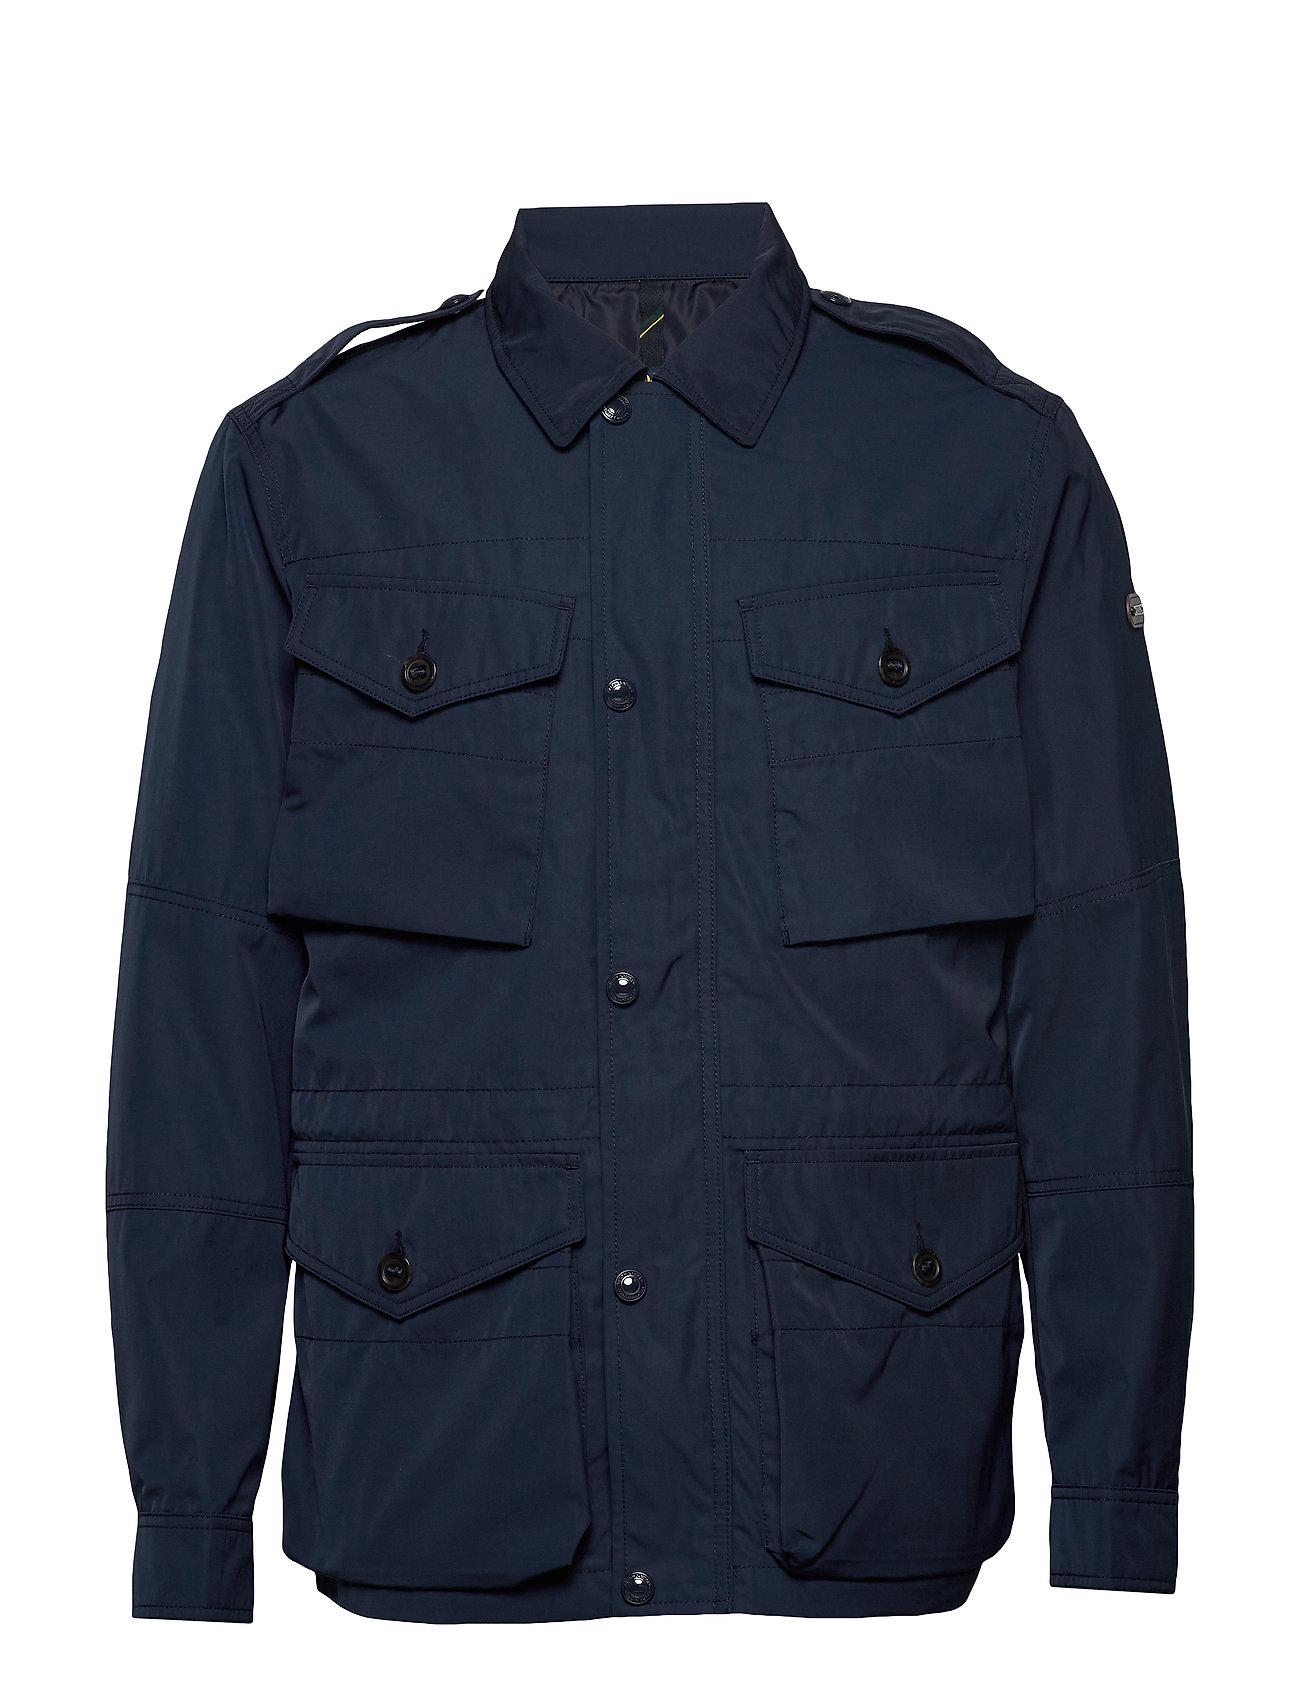 Polo Ralph Lauren Four-Pocket Oxford Jacket - AVIATOR NAVY